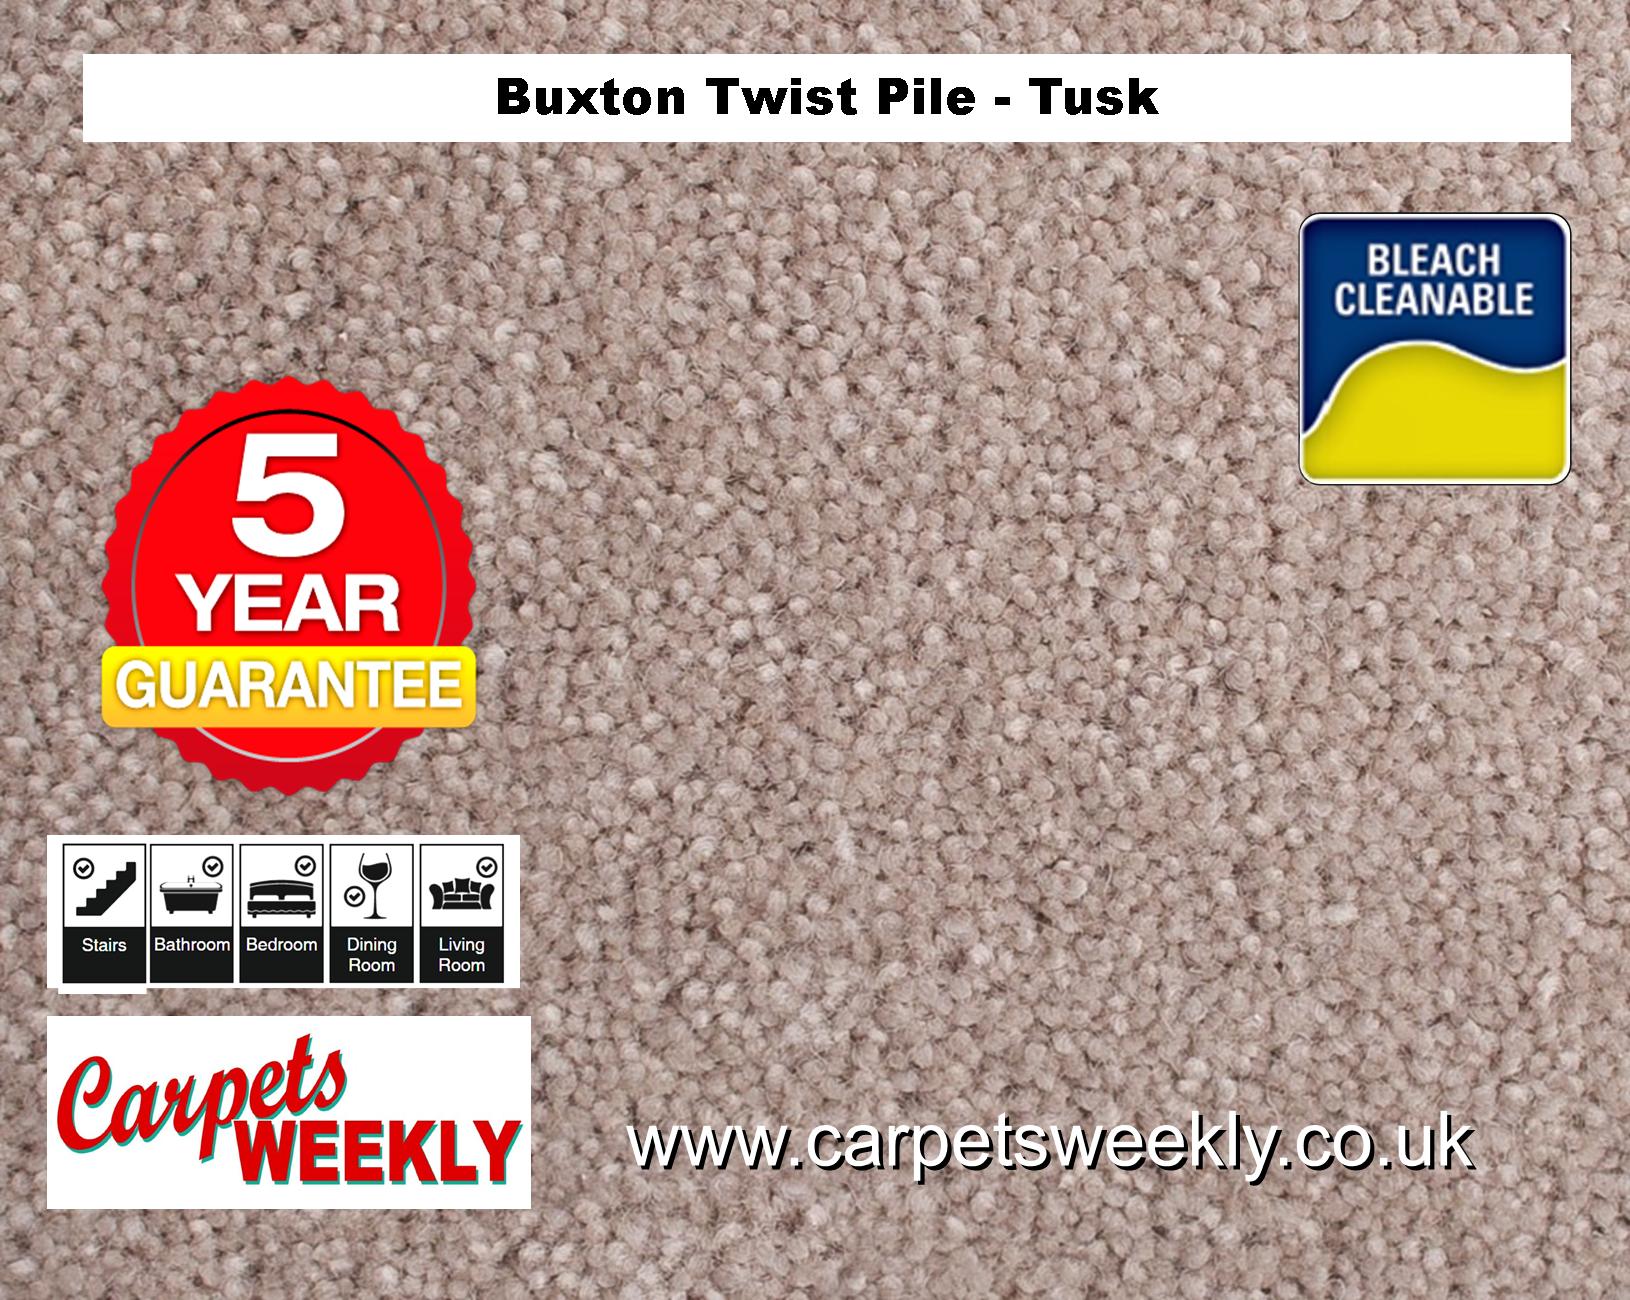 Carpets Weekly Buxton Tusk